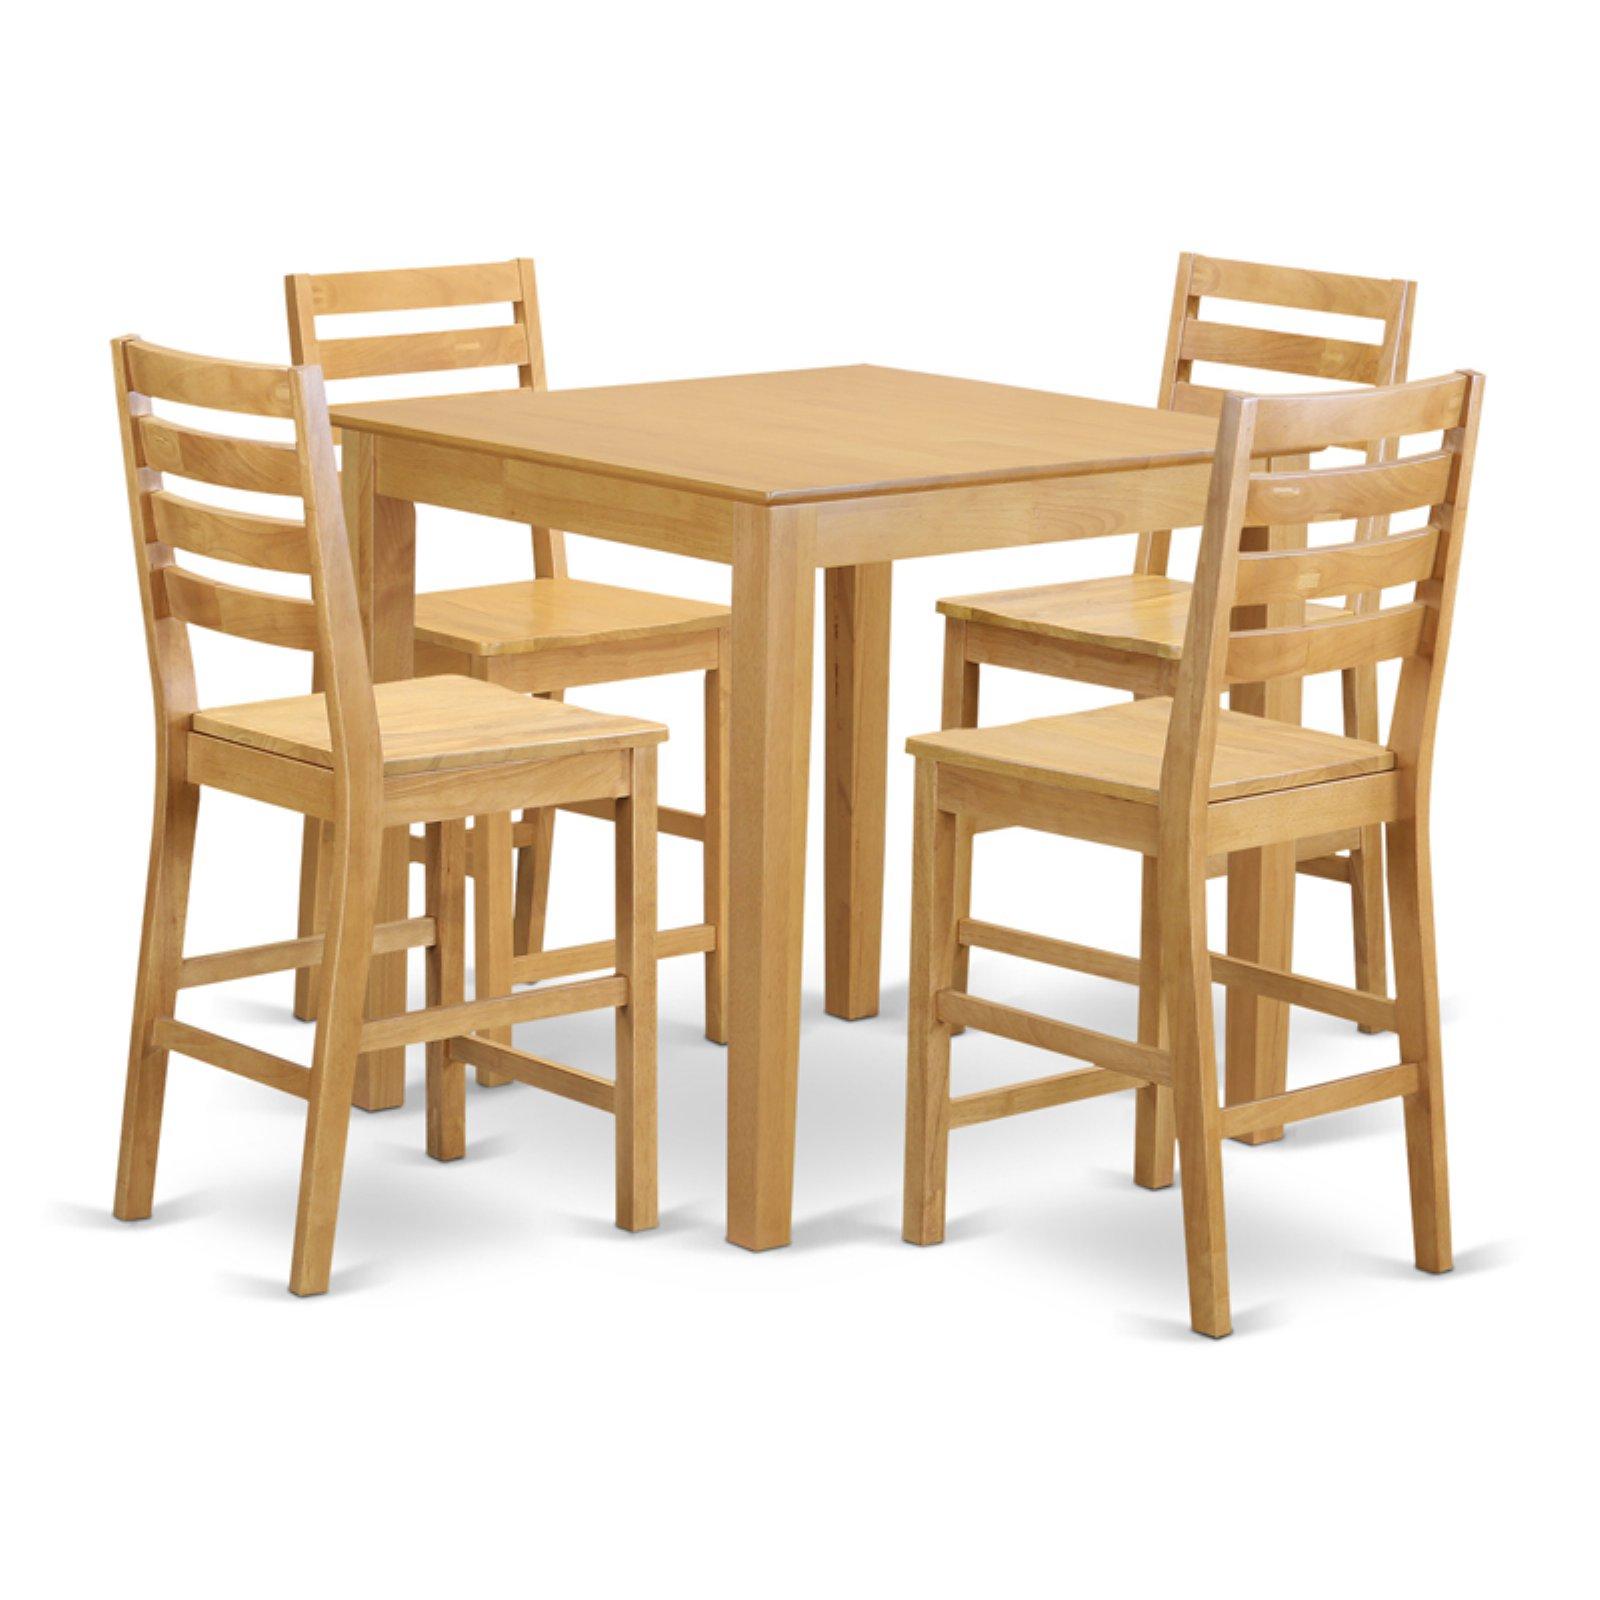 East West Furniture Pub 5 Piece High Ladder Dining Table Set